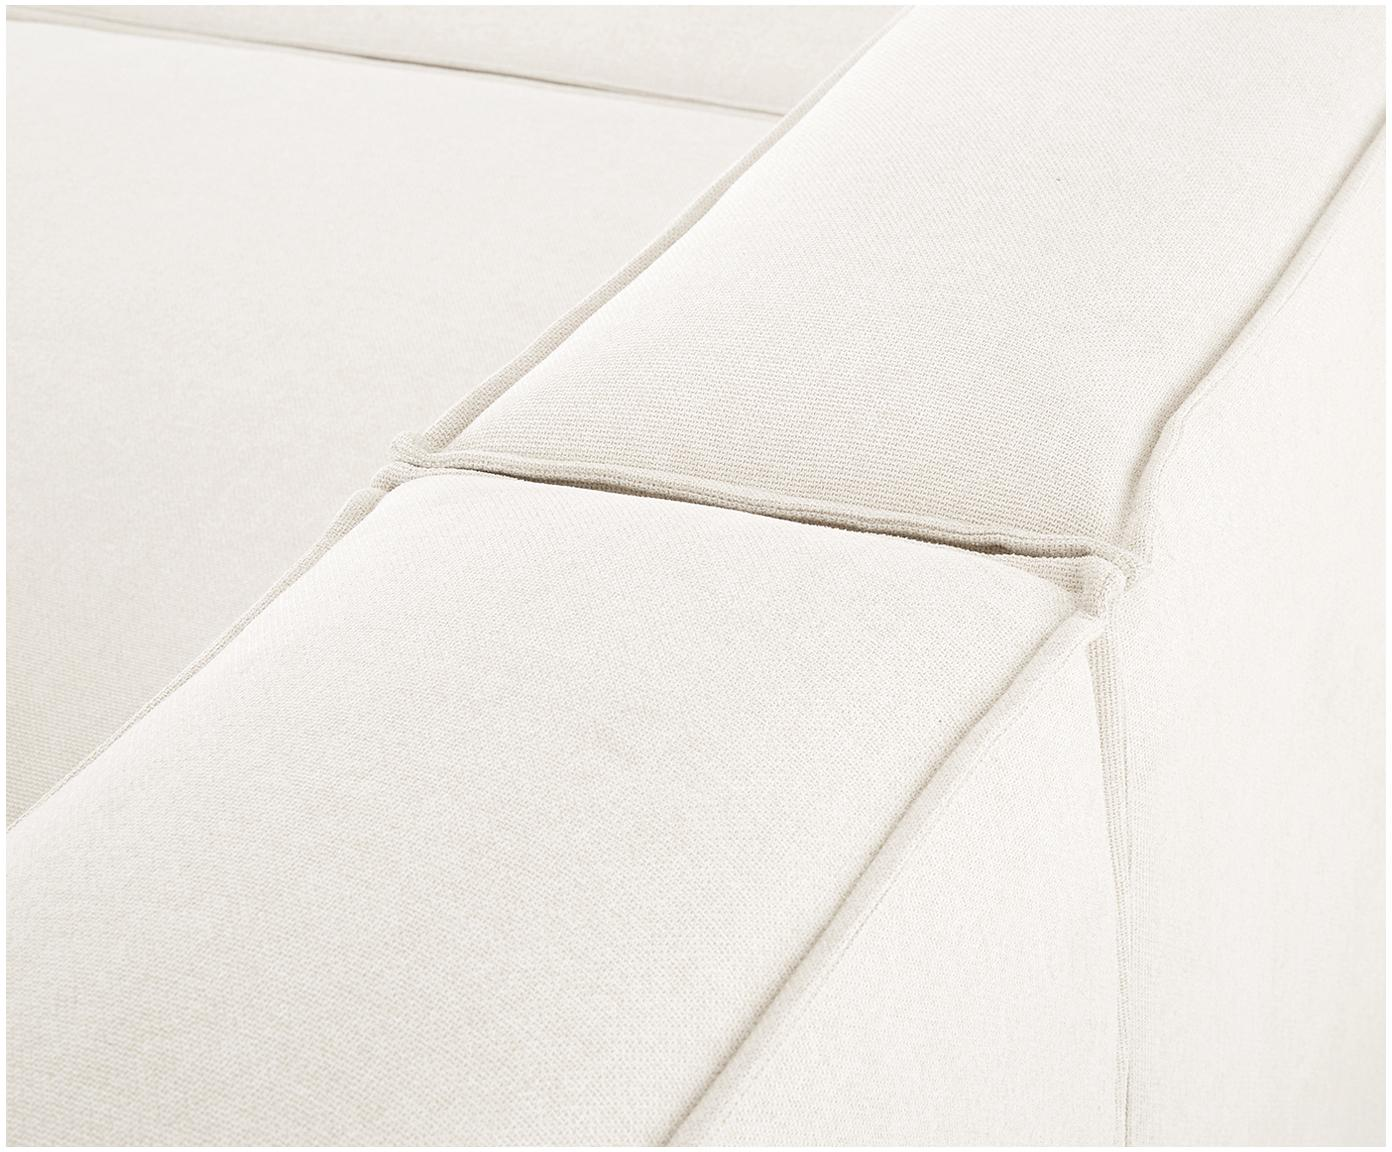 Modulaire bank Lennon (4-zits), Bekleding: polyester, Frame: massief grenenhout, multi, Poten: kunststof, Beige, B 326 x D 119 cm